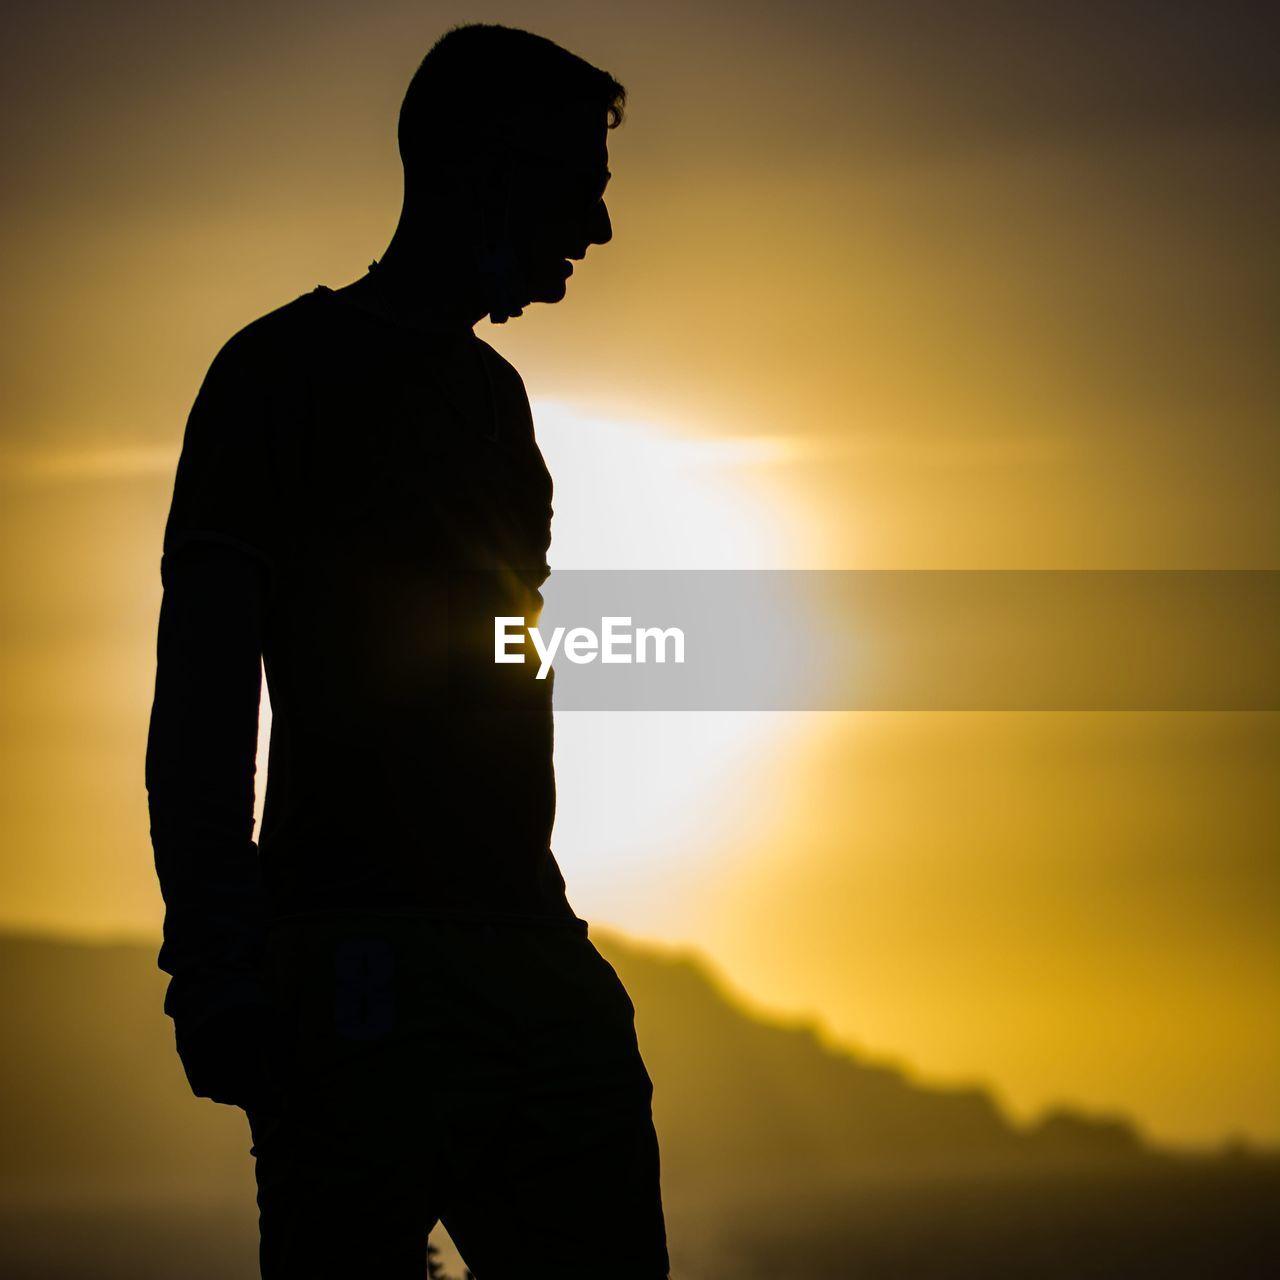 SILHOUETTE MAN STANDING AGAINST ORANGE SUNSET SKY